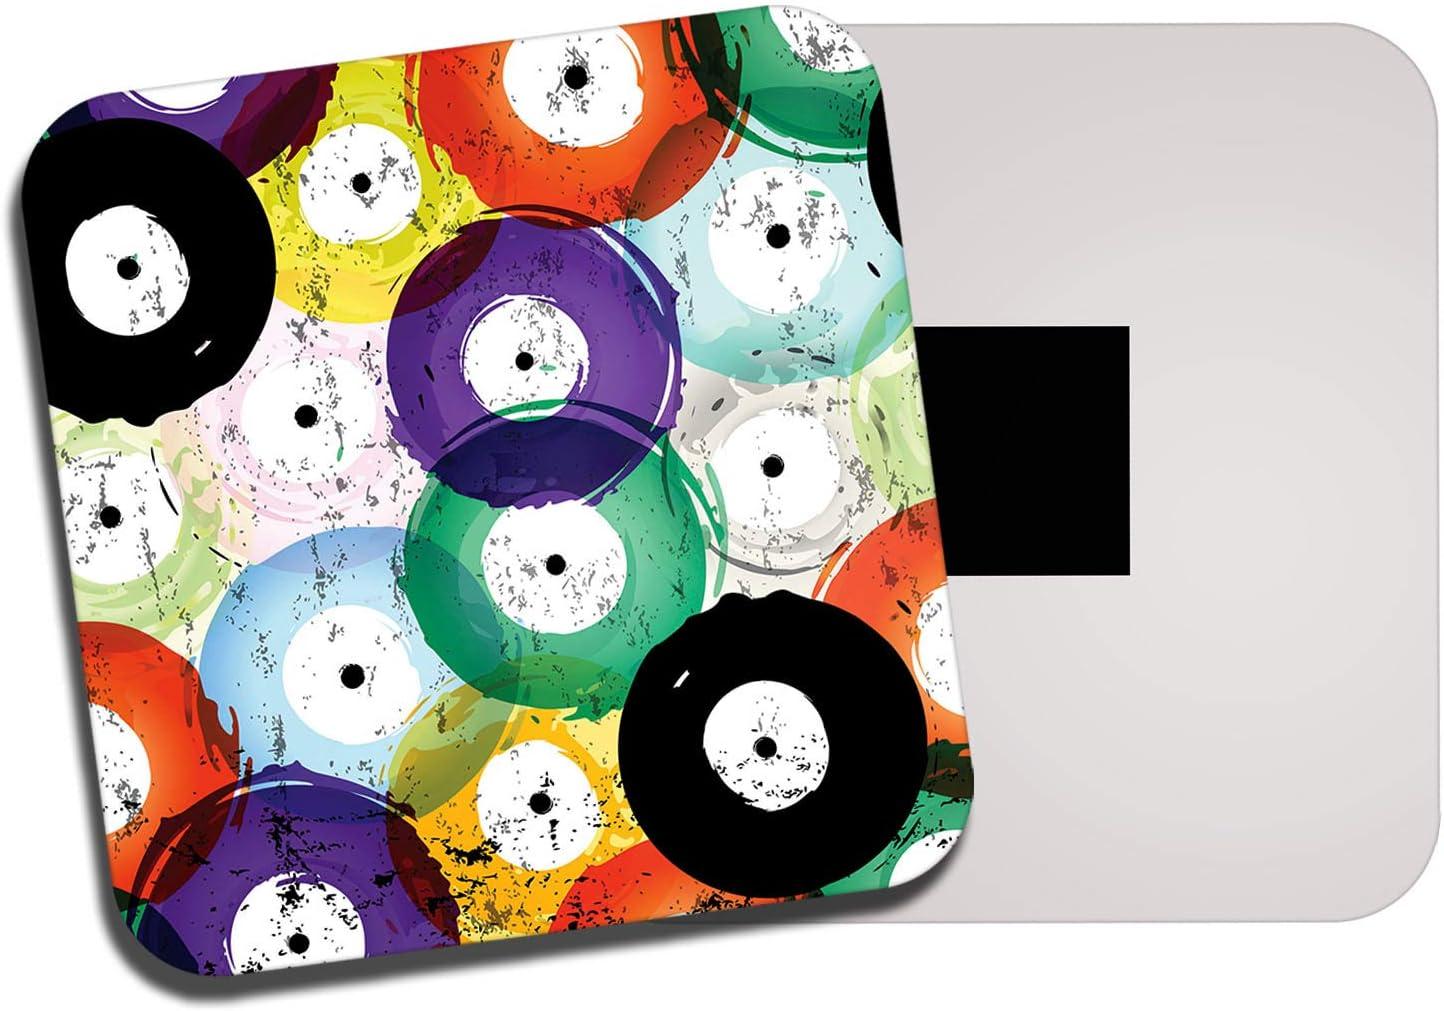 Bright Vinyl Records Fridge Magnet - Music DJ Mum Dad Retro Vintage Gift #14230